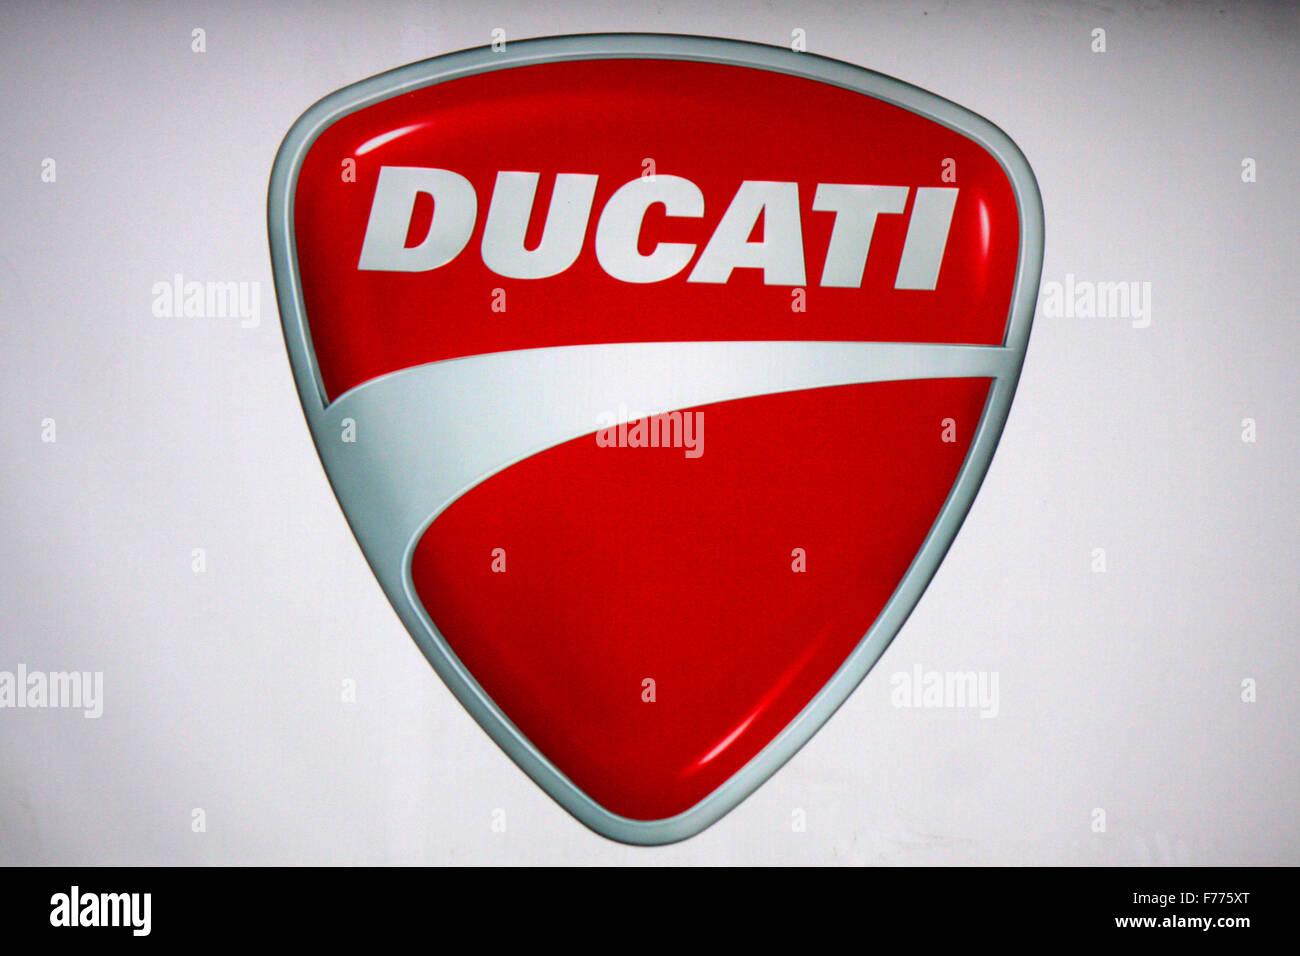 Markennamen: 'Ducati', Landeck, Oesterreich. - Stock Image